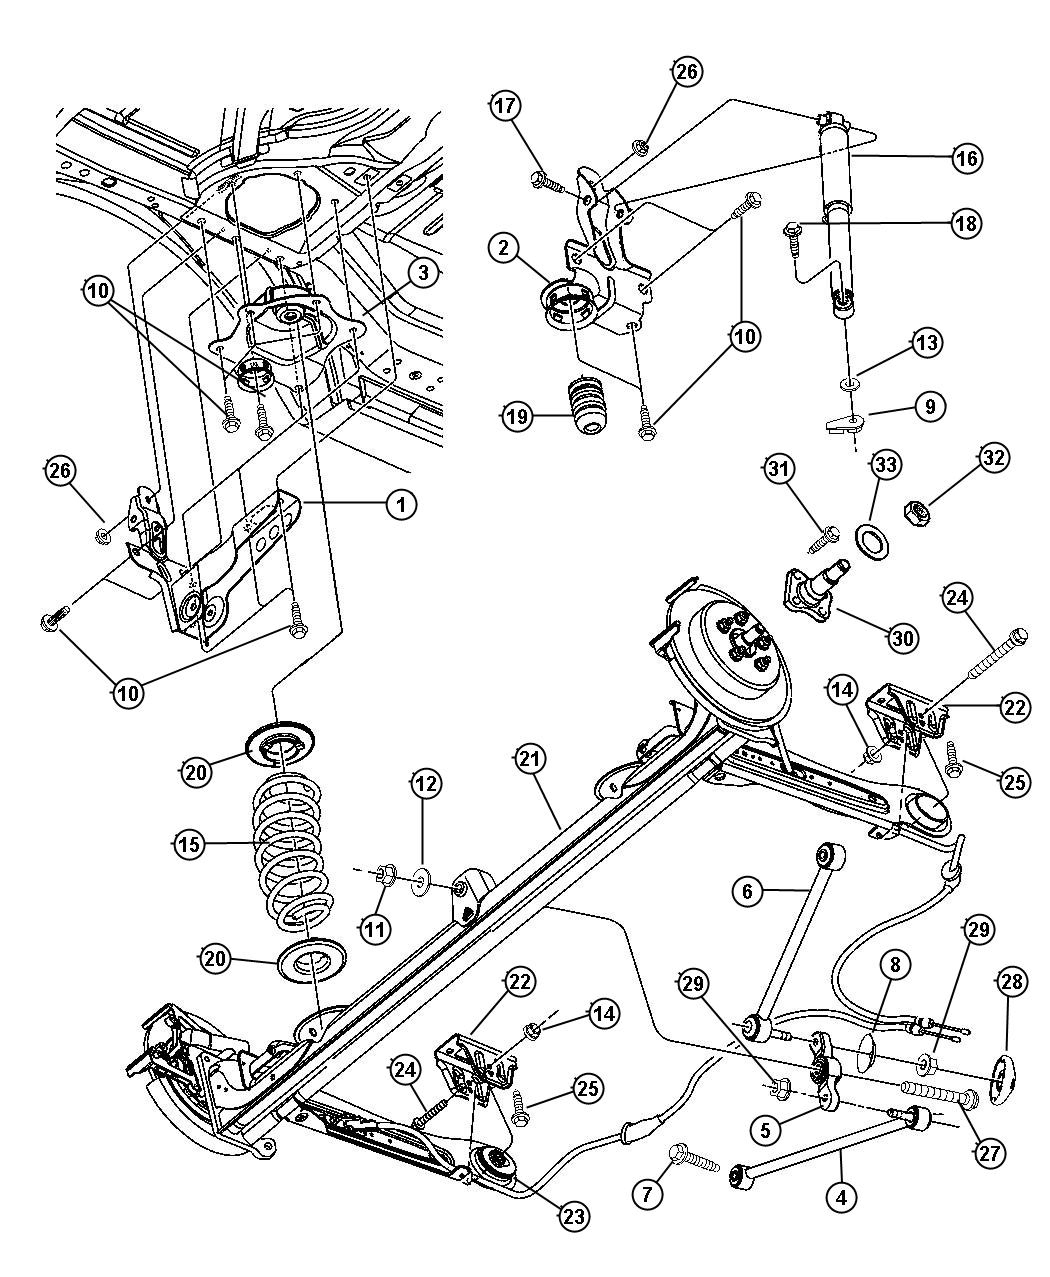 2001 pt cruiser wiring diagram wire three way switch 2002 parts imageresizertool com